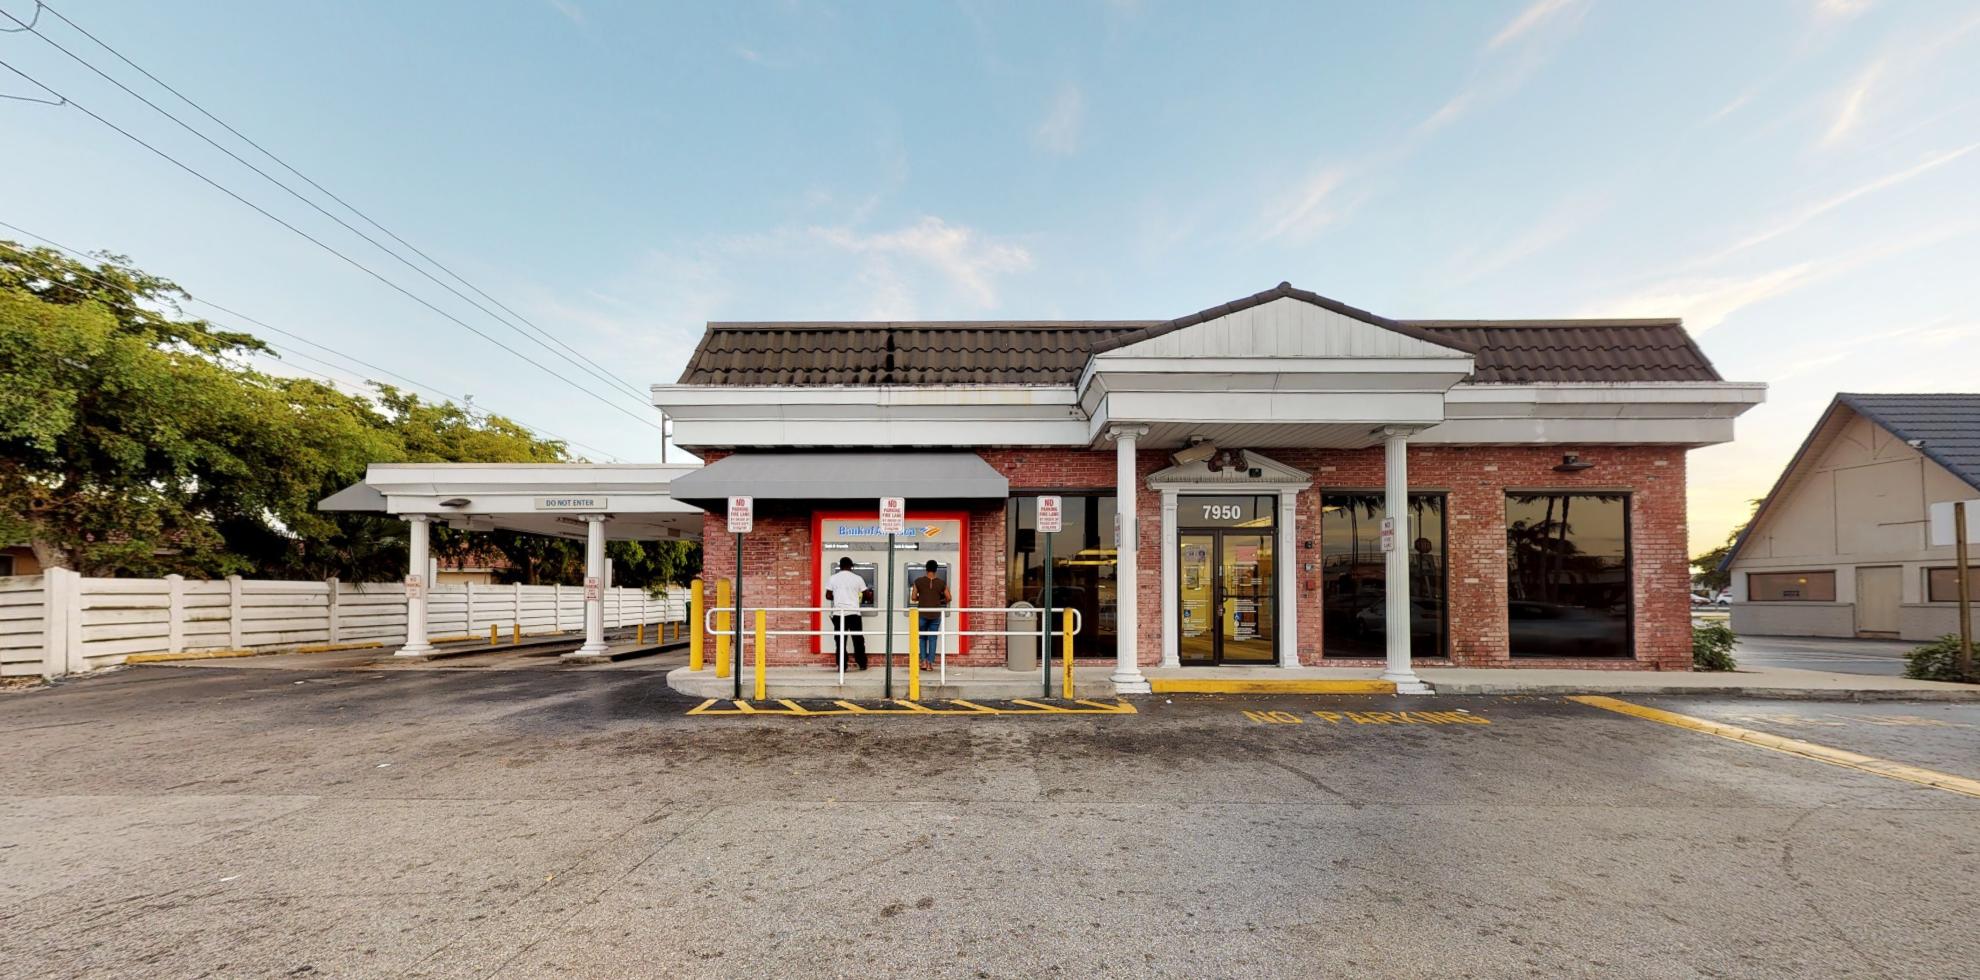 Bank of America financial center with walk-up ATM | 7950 Miramar Pkwy, Miramar, FL 33023